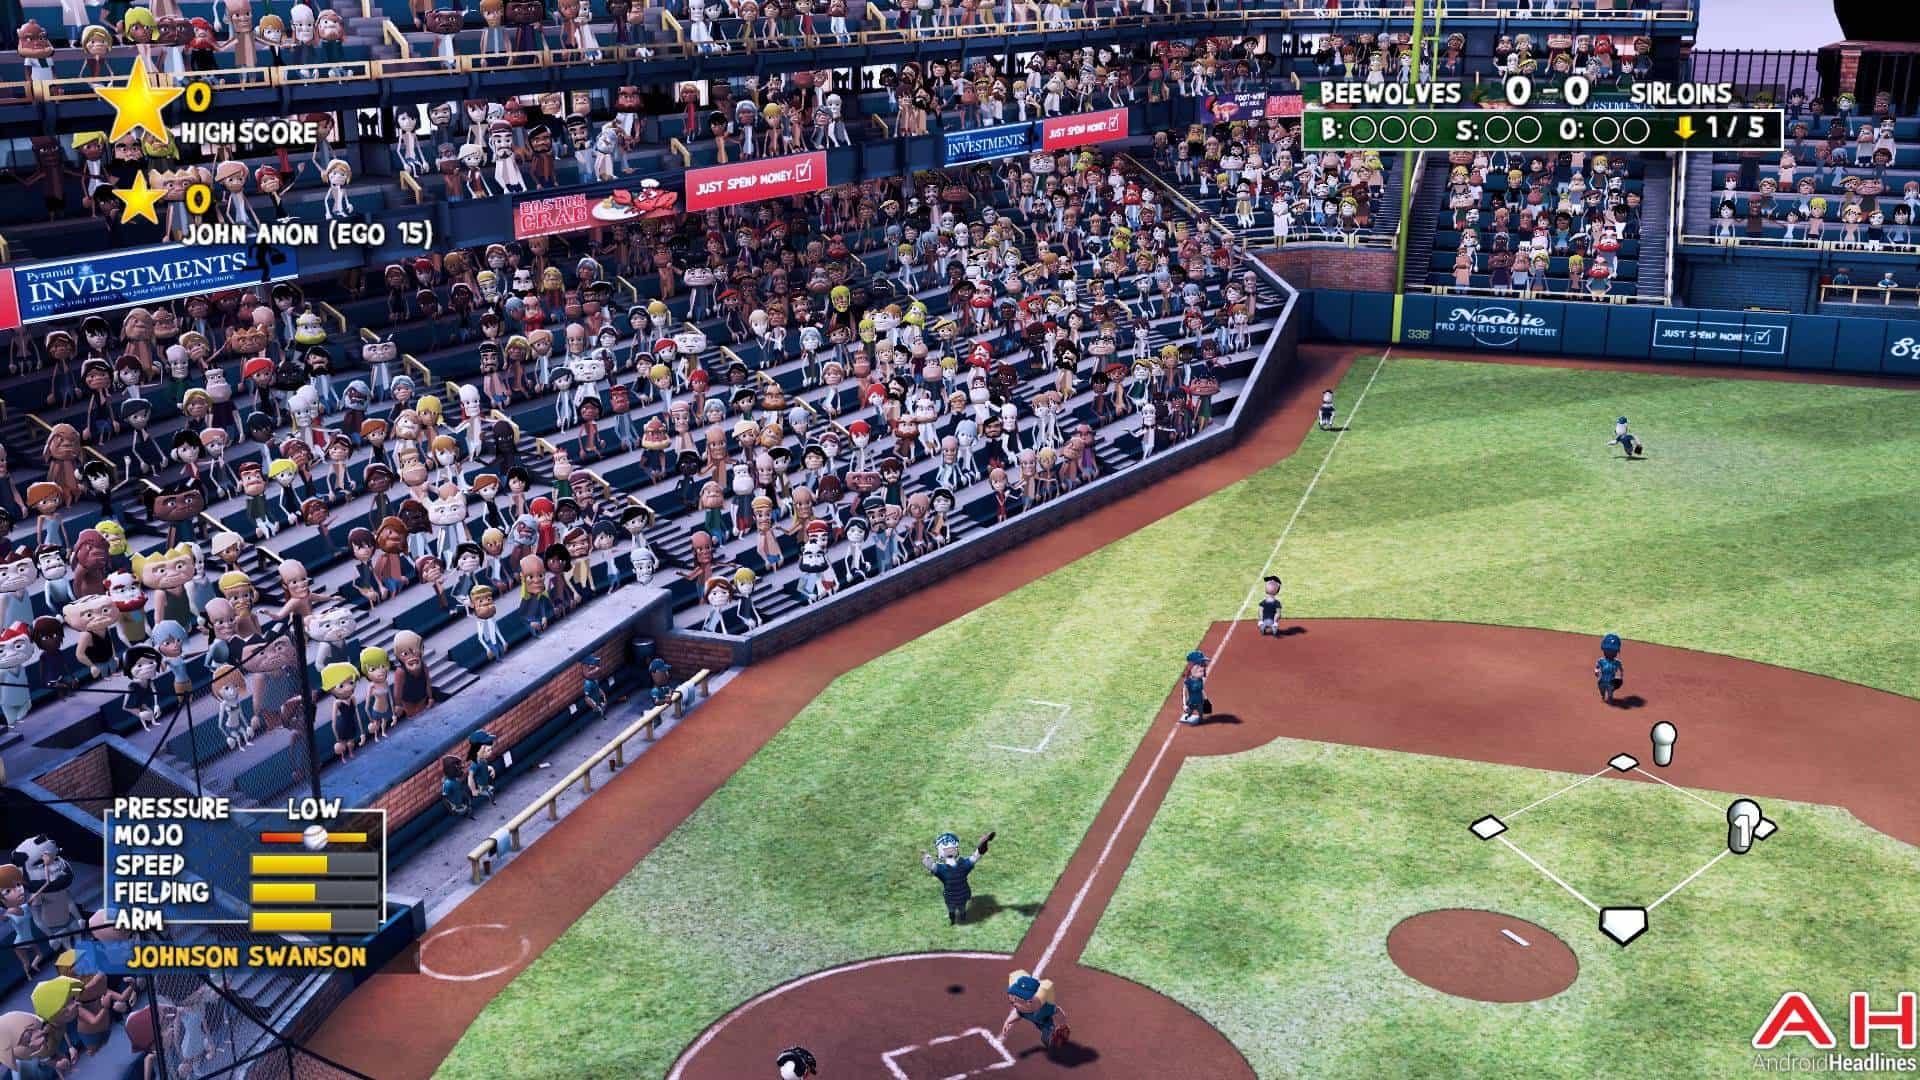 Super Mega Baseball Android TV AH 12